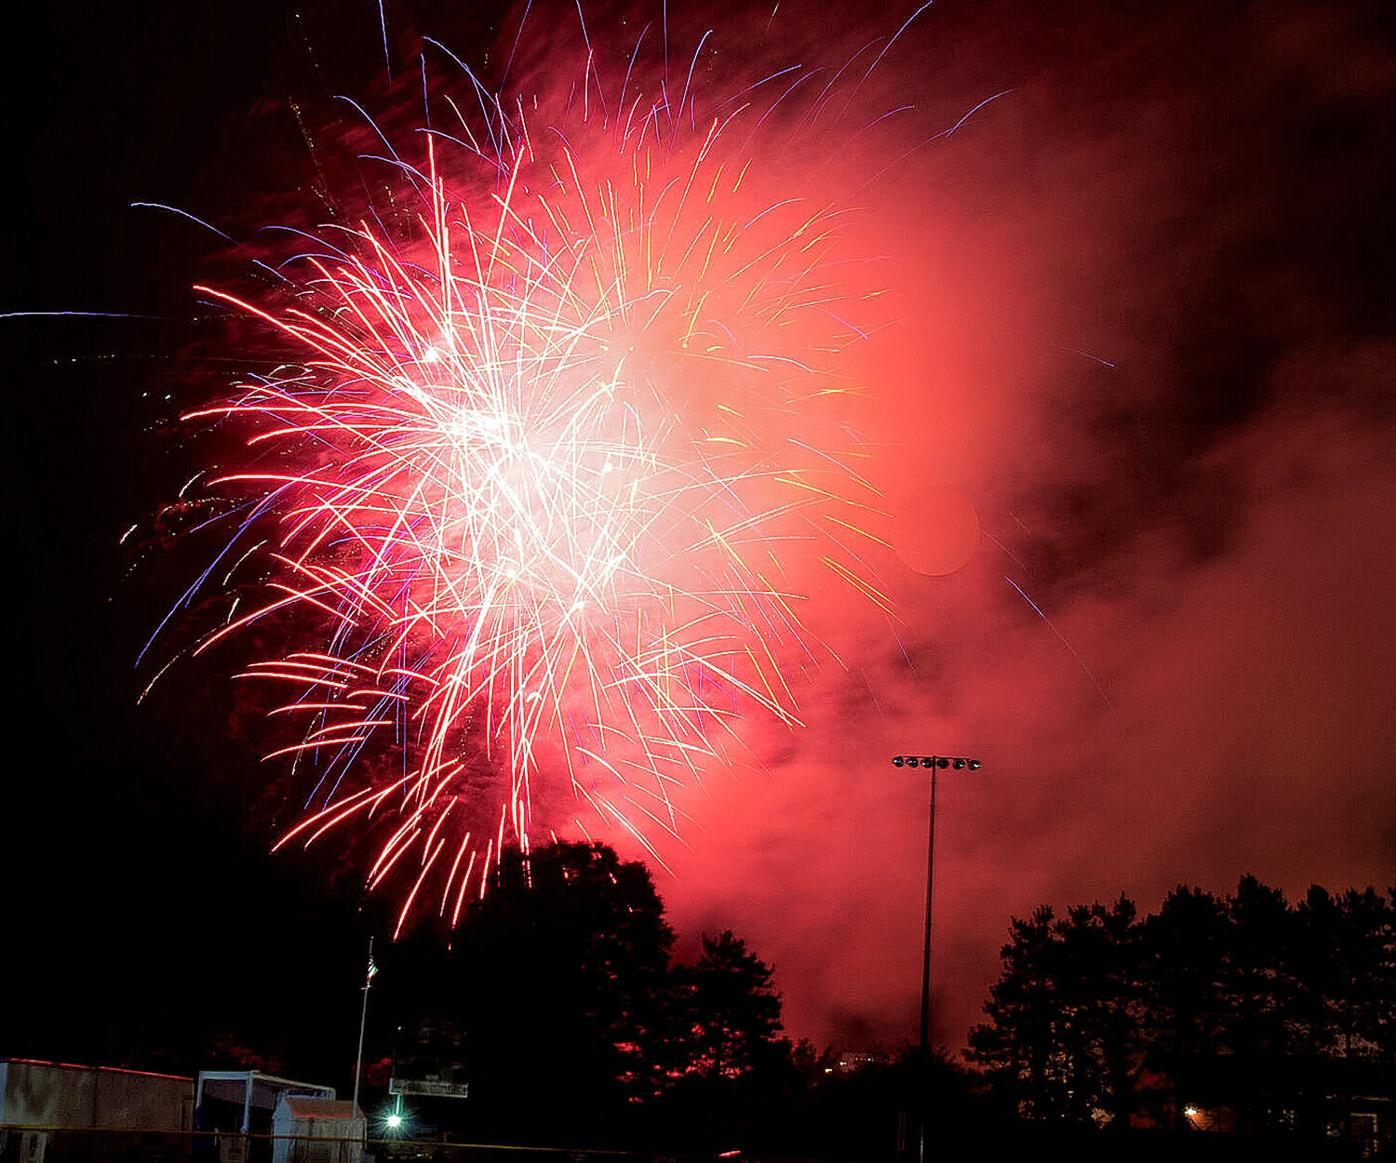 Autumnfest Fireworks